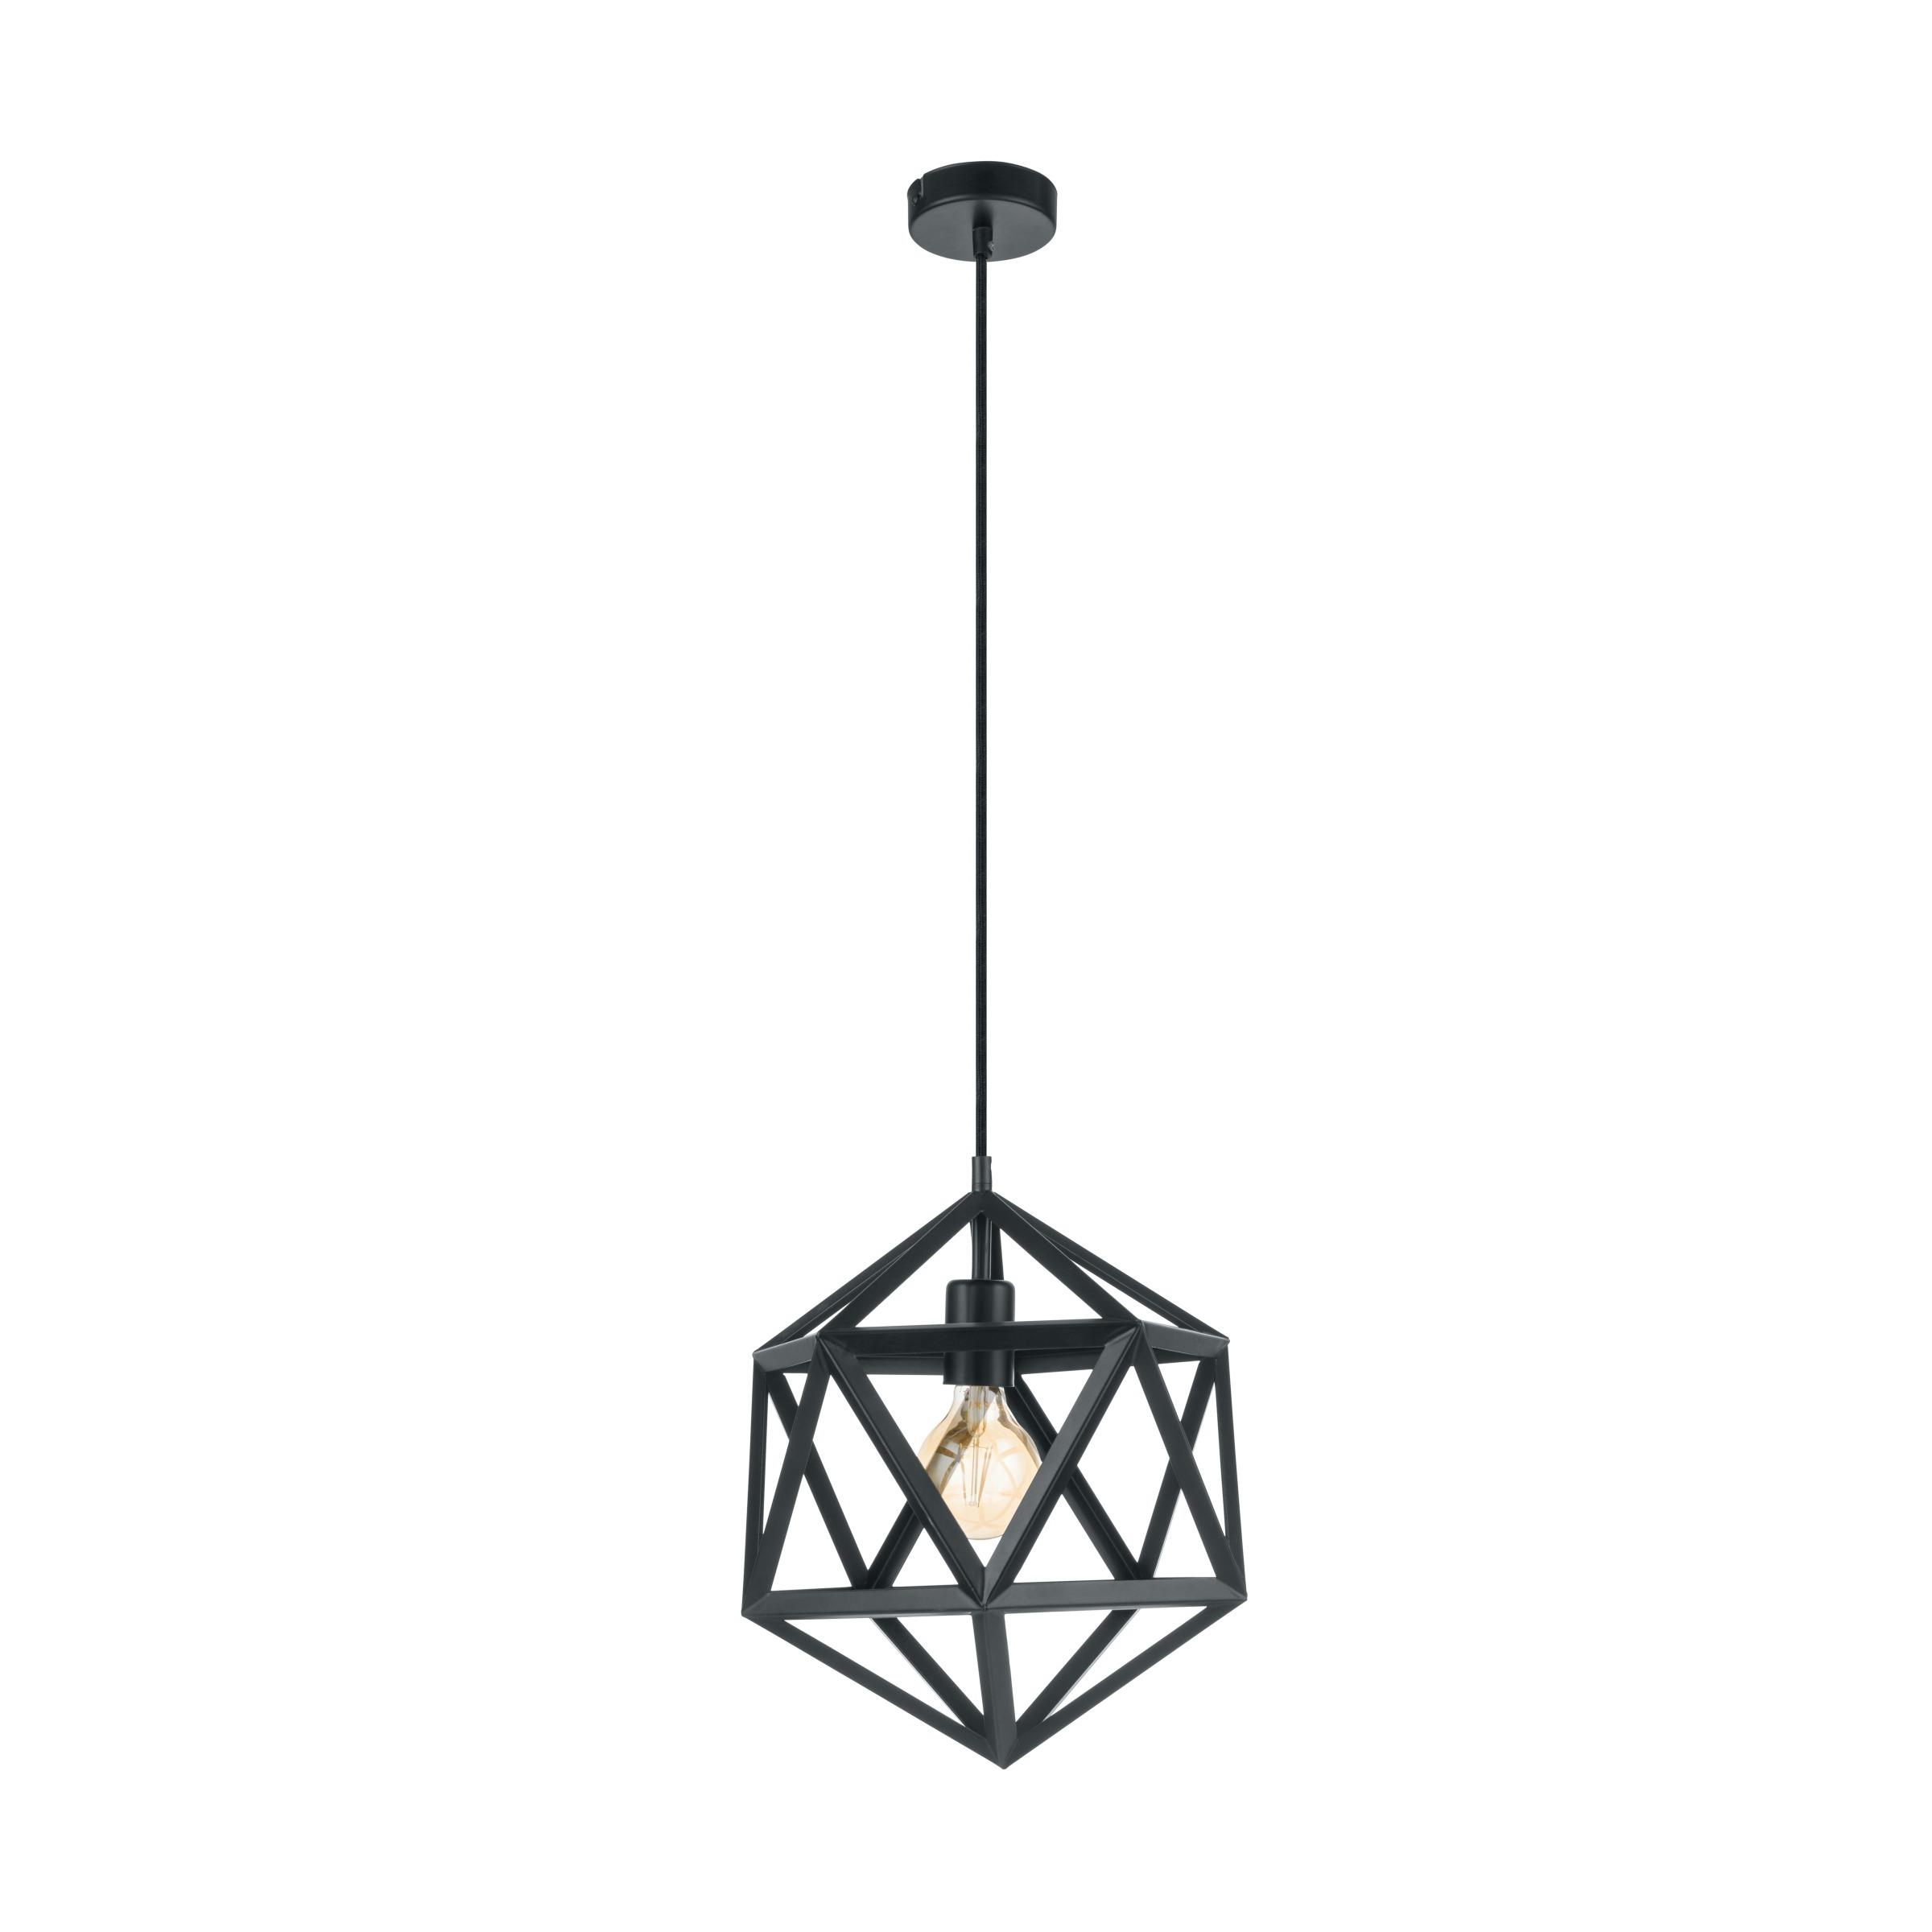 Eglo Embleton Hanglamp Zwart ø 30 cm